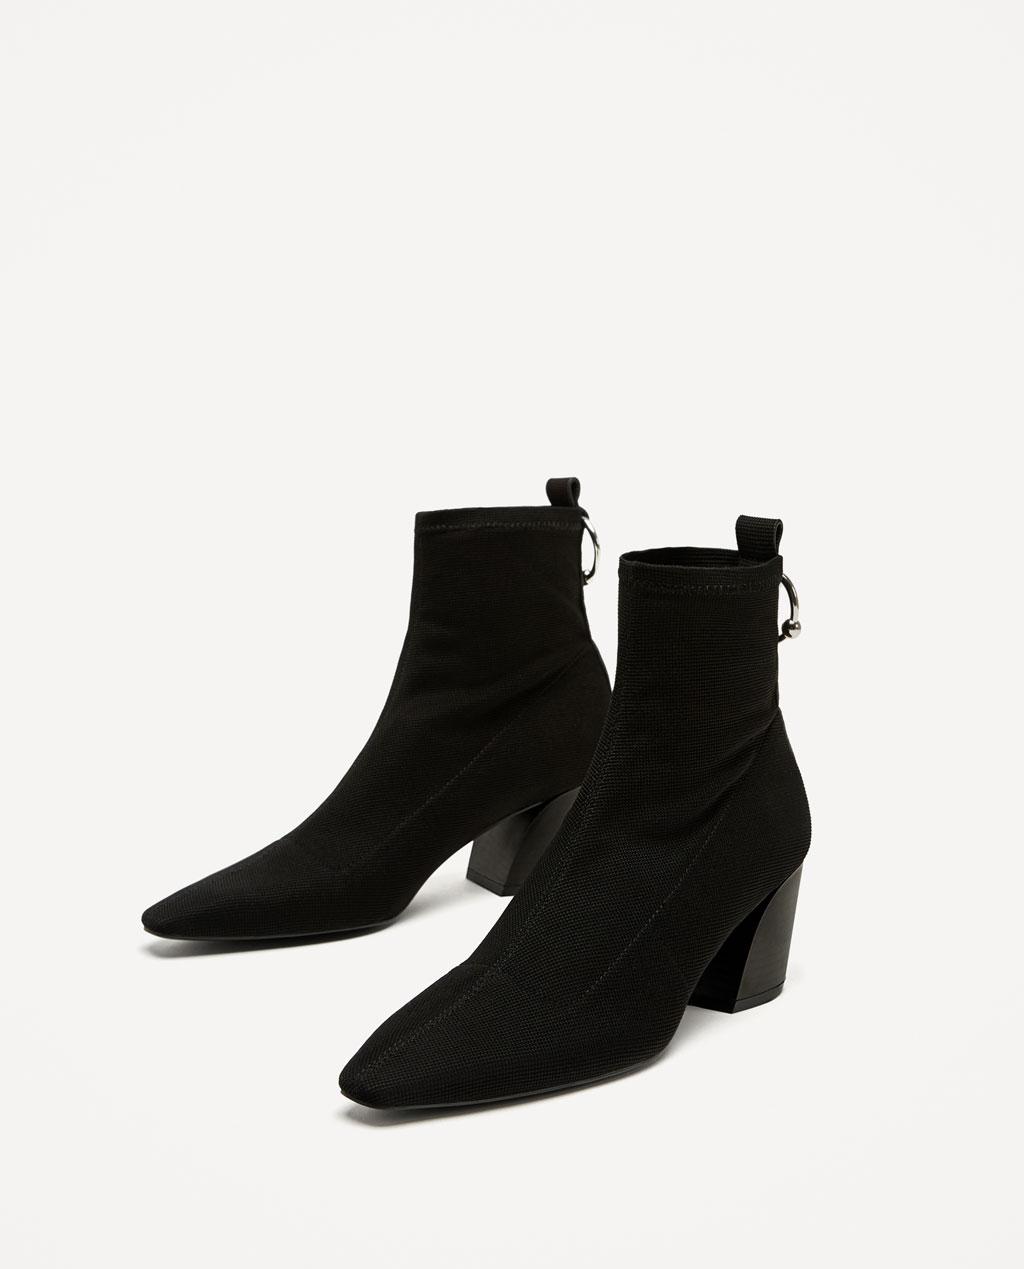 Scarpe Zara 2018 stivaletti